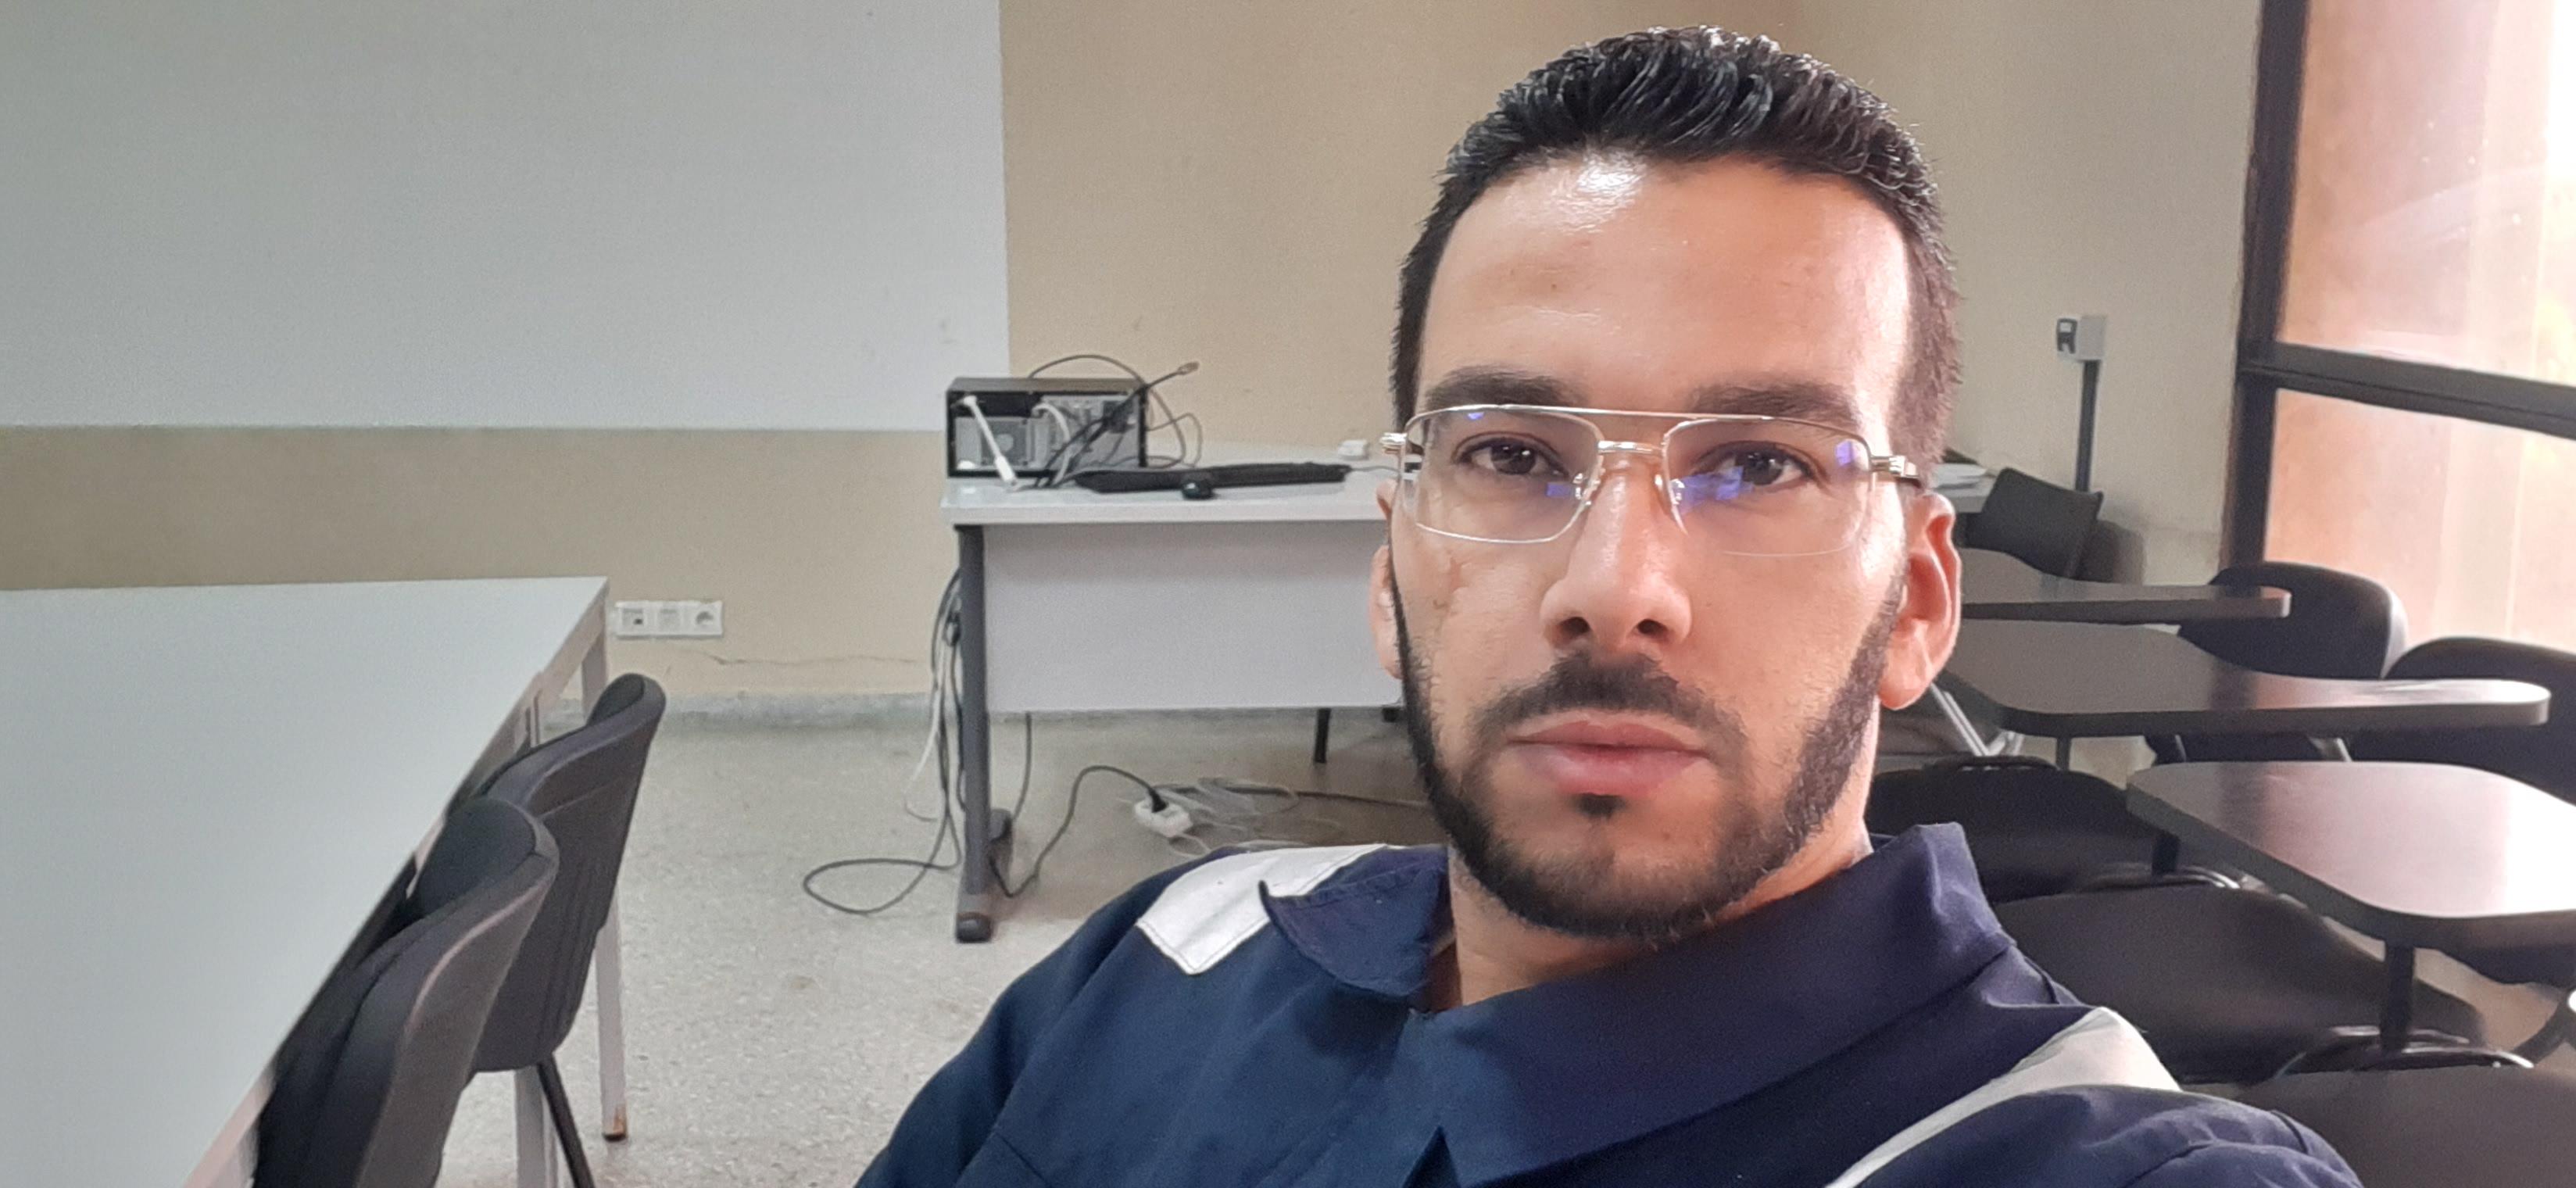 Elouafyyounes Profile Picture